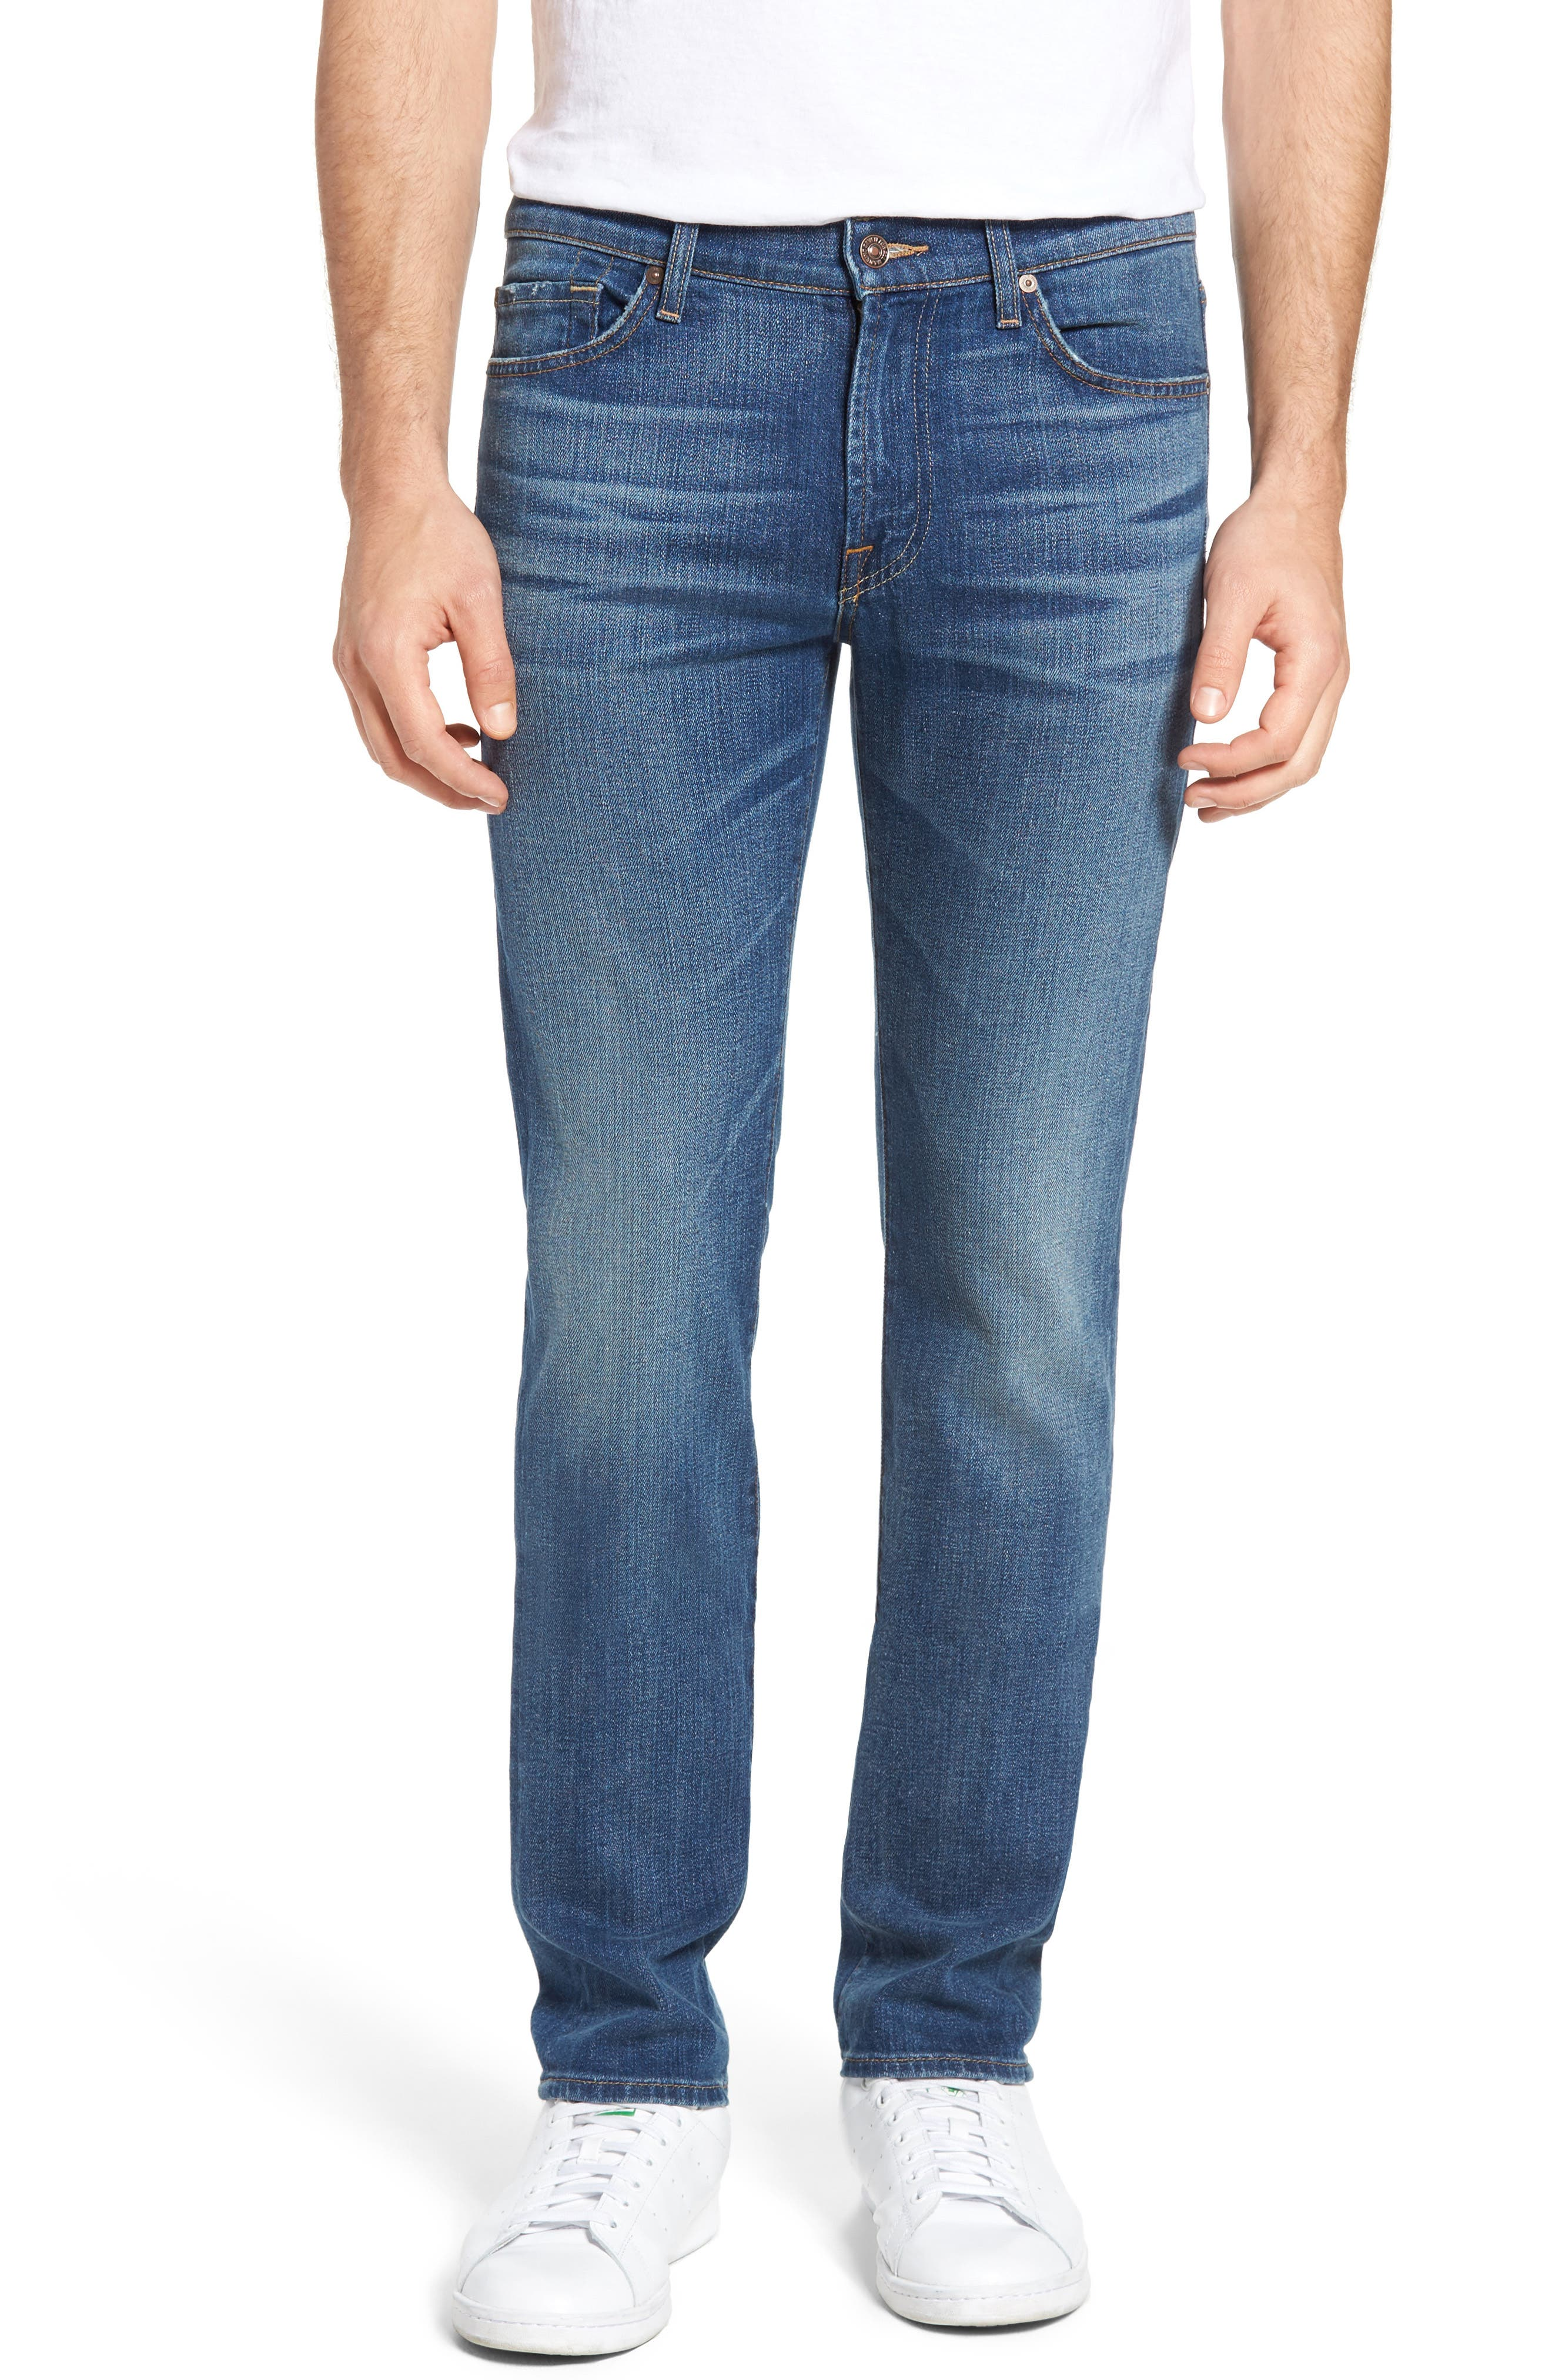 Slimmy Slim Fit Jeans,                         Main,                         color, Sixties Vintage